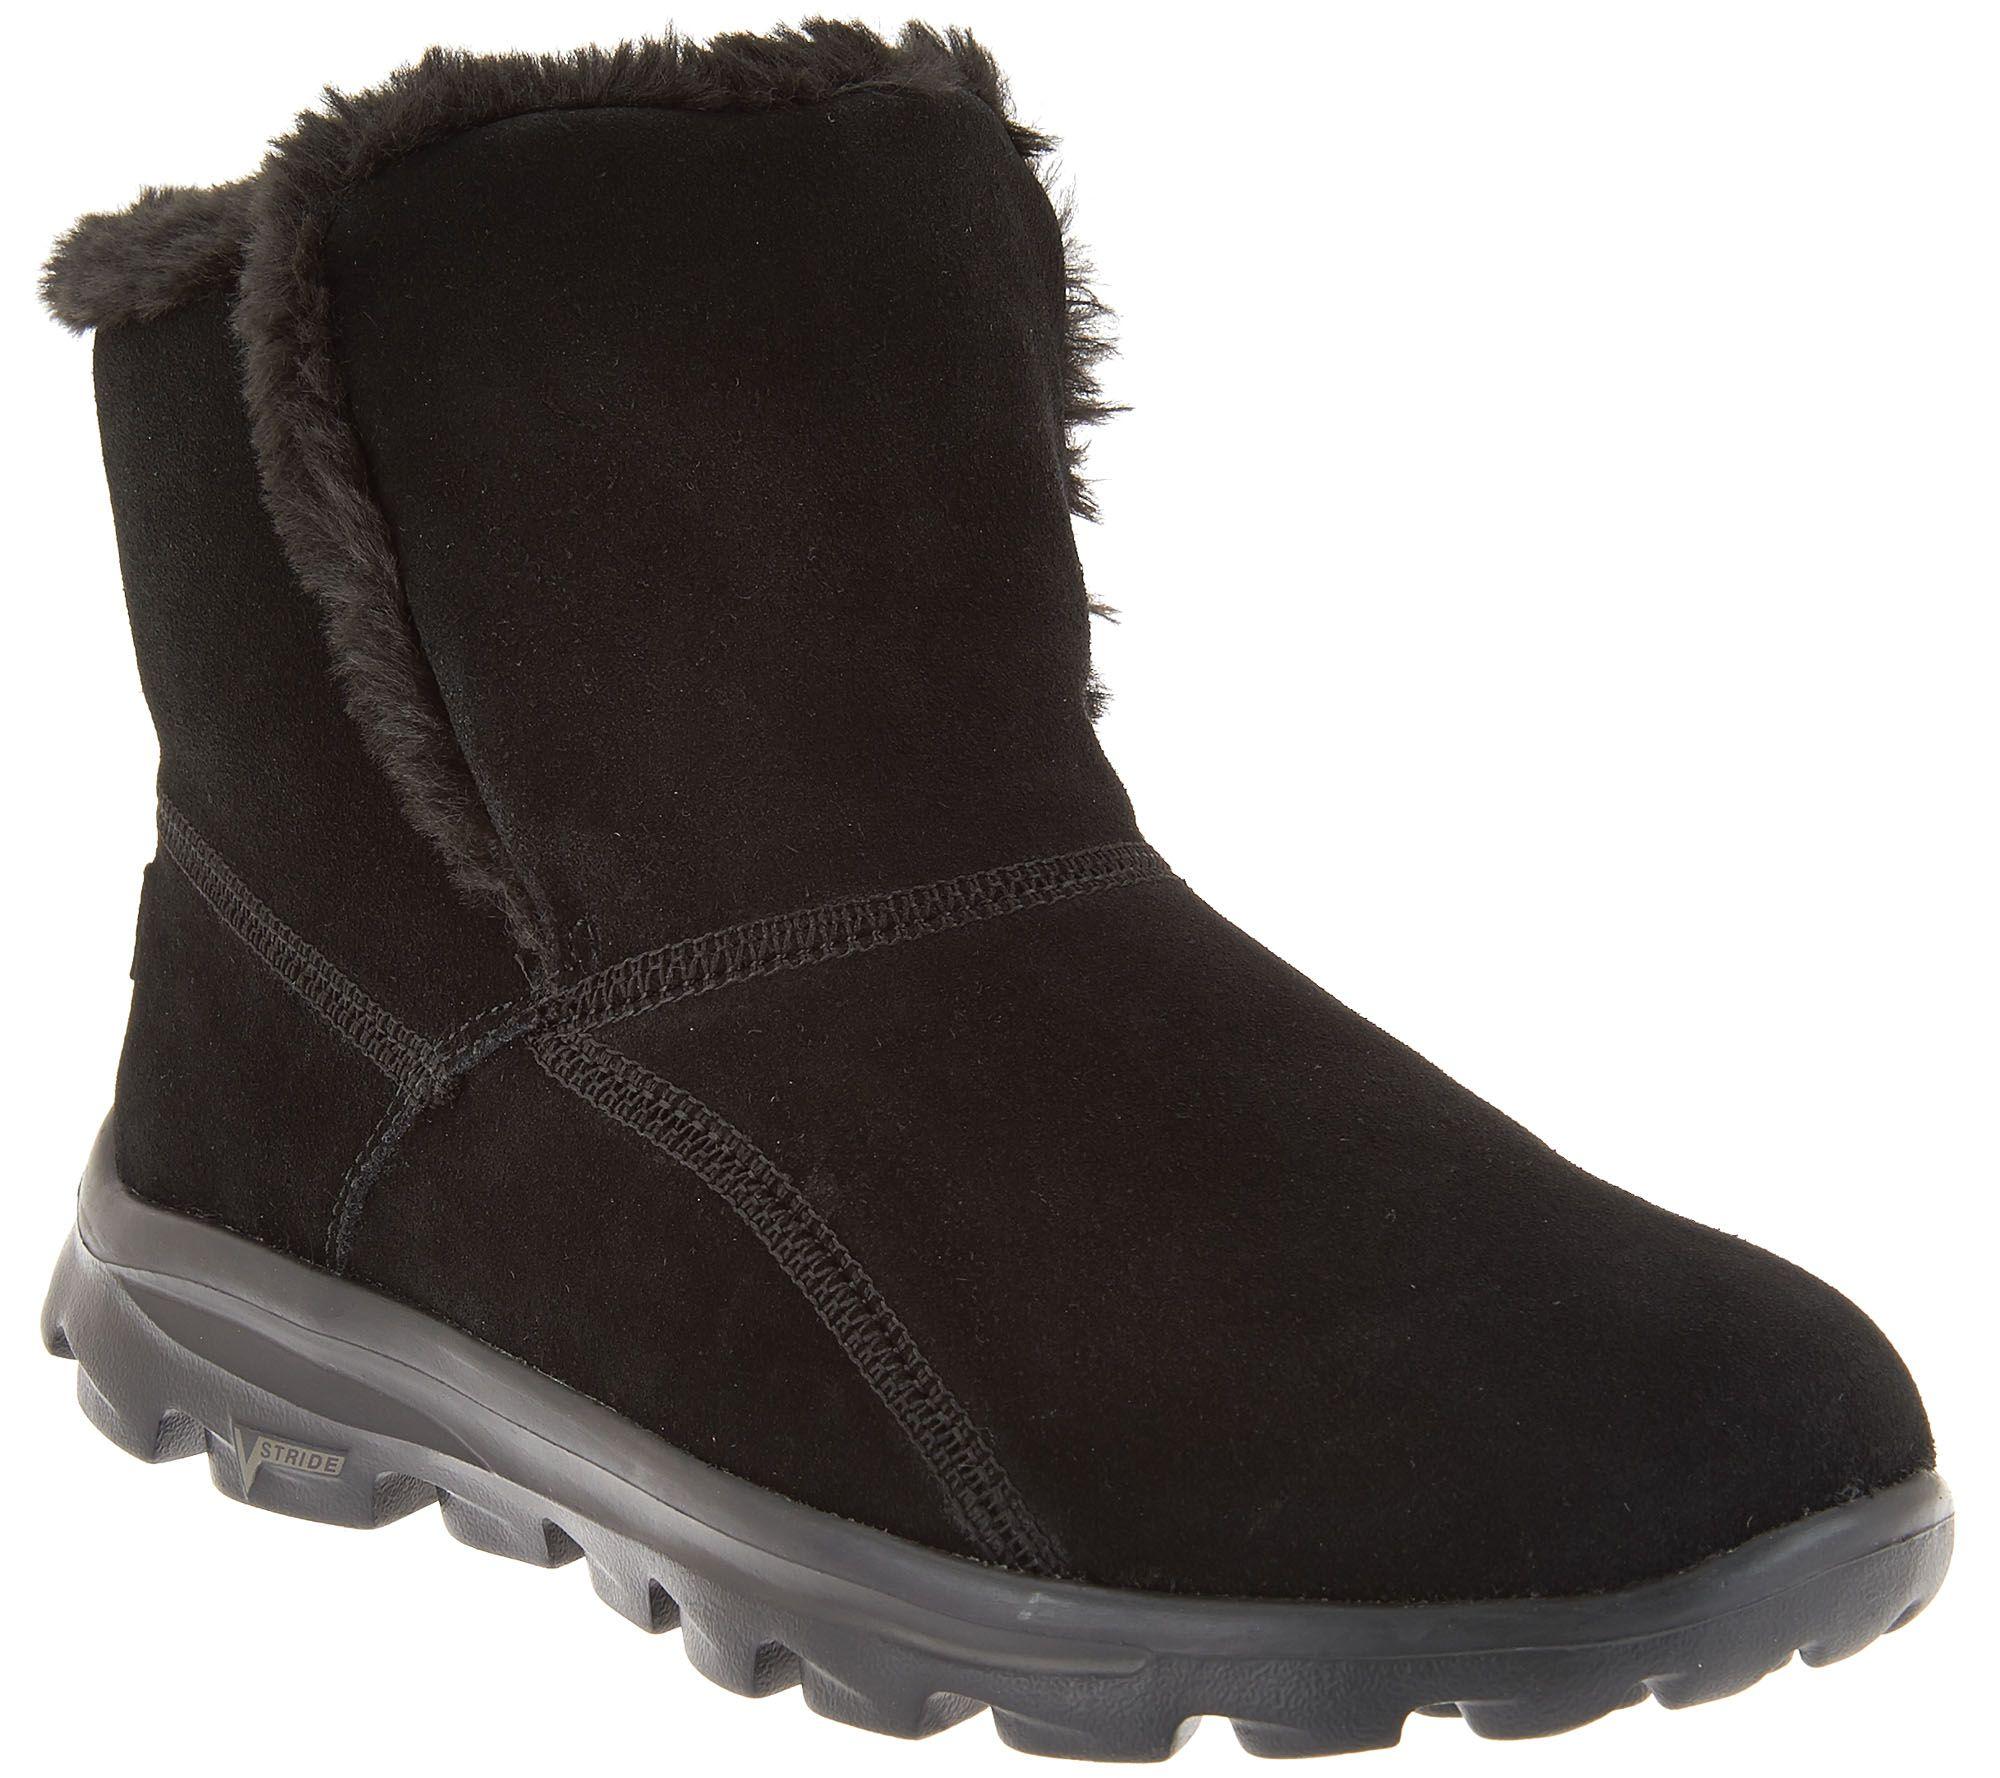 bded1a22a6 Skechers GOWalk Suede Faux Fur Boots w/ Goga Mat - Dazzling - Page 1 —  QVC.com